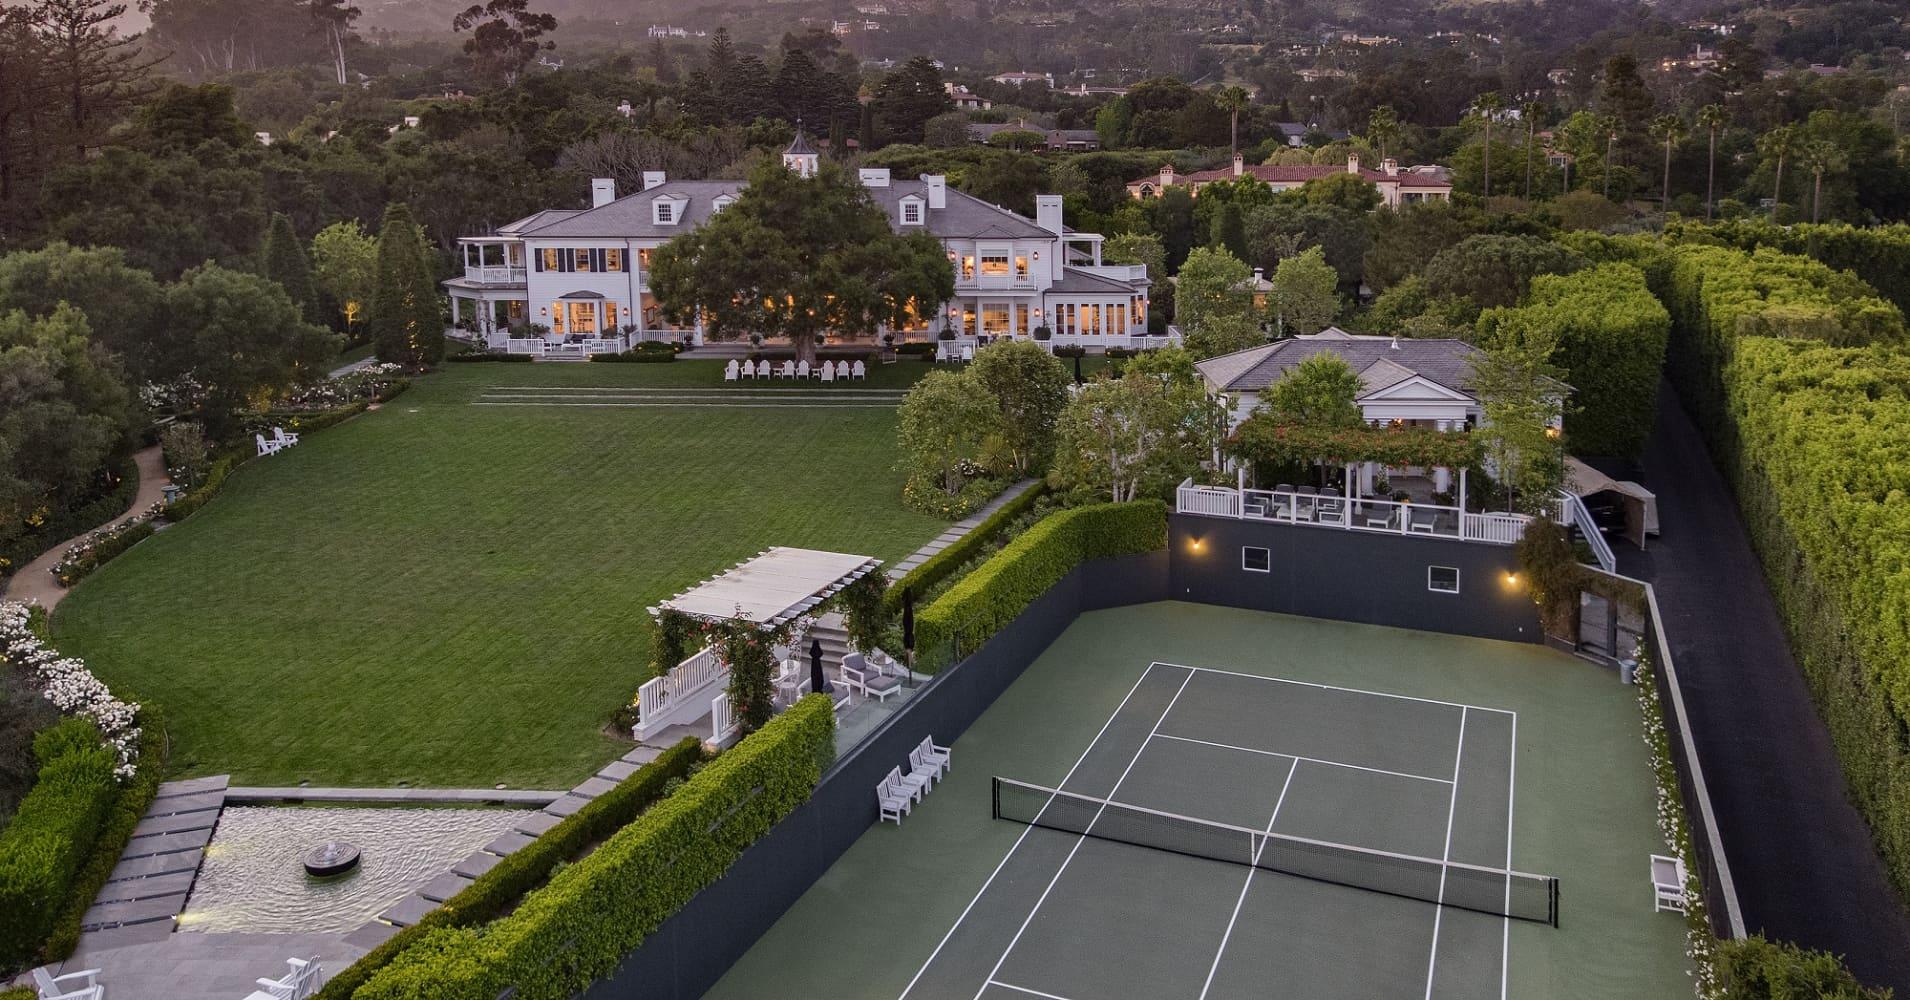 Inside Rob Lowe's $47 million California mansion — where Oprah's a neighbor